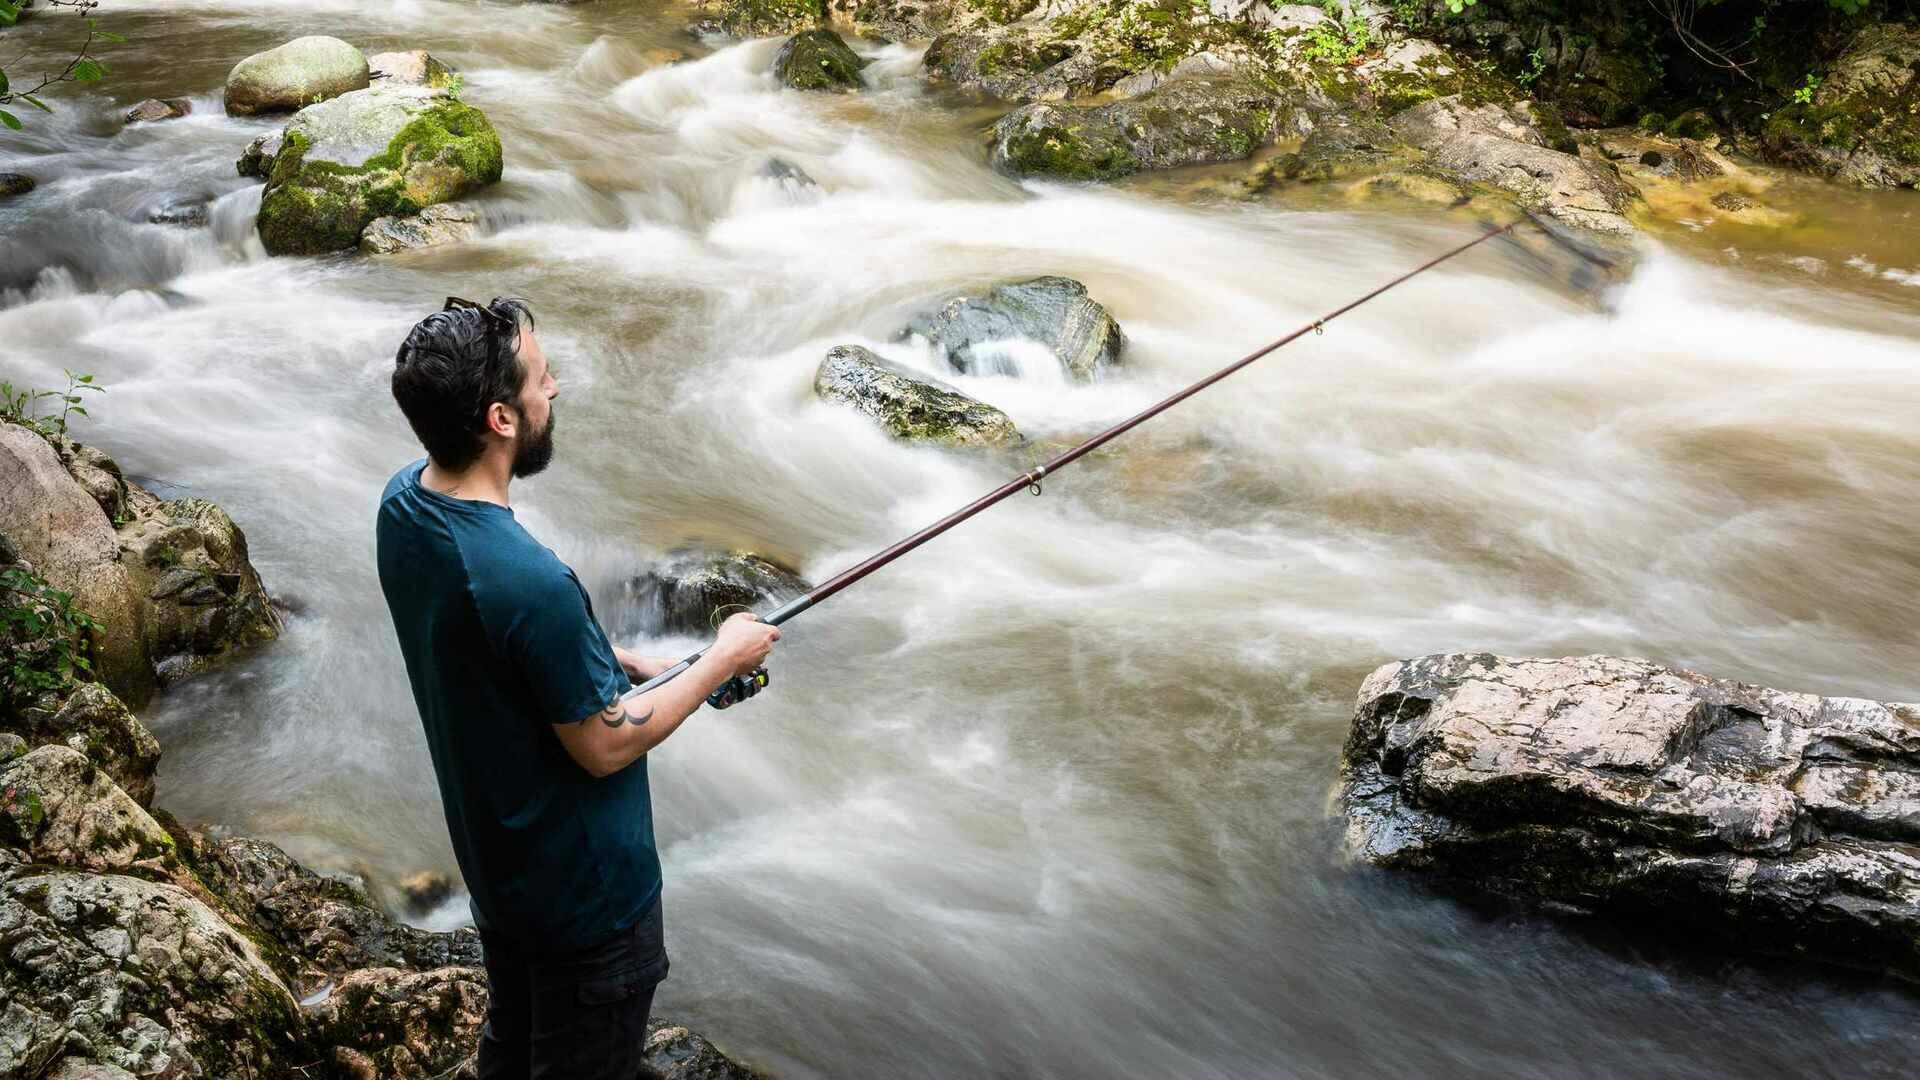 Pesca per ©JCMilhet